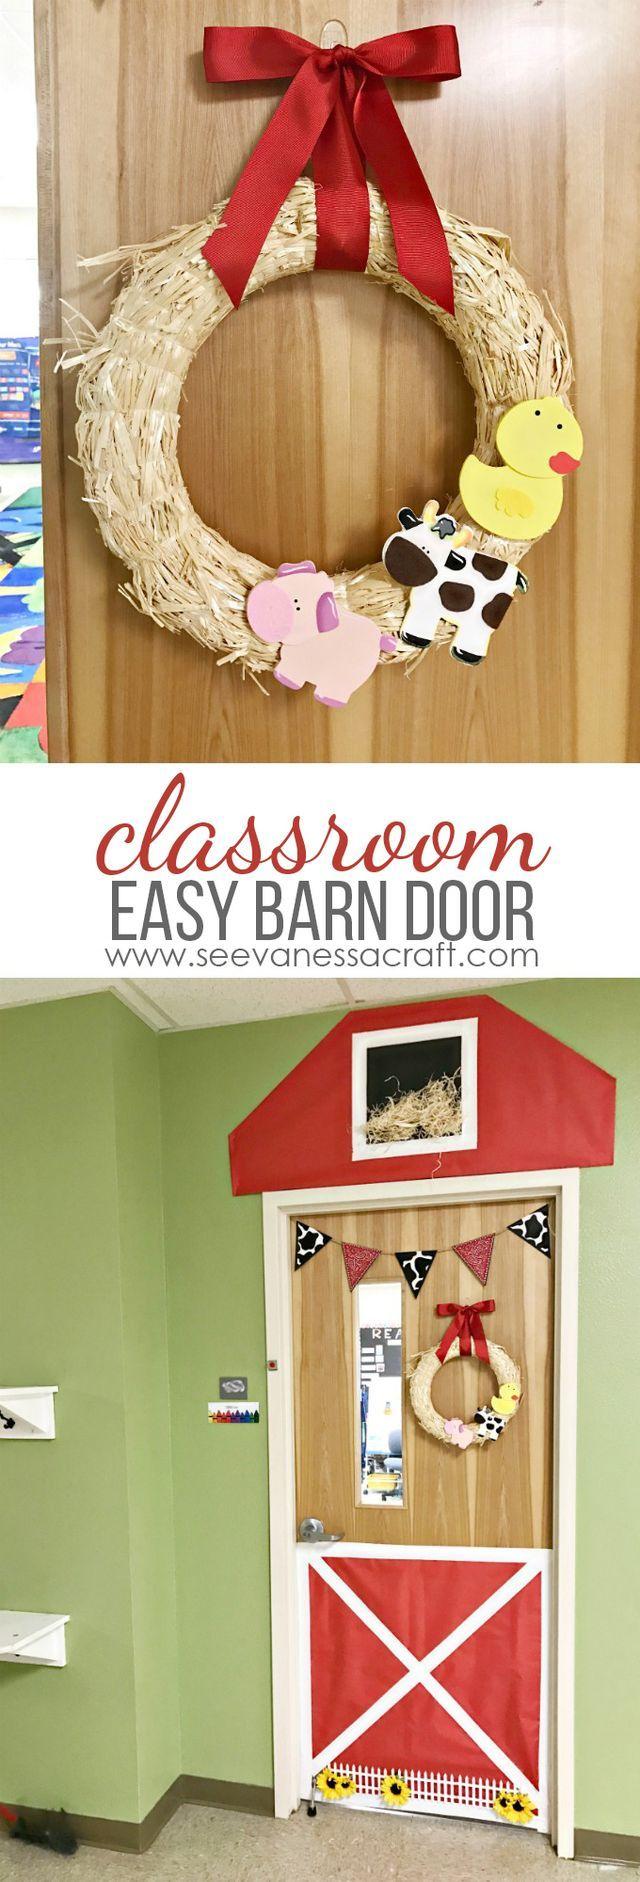 Easy classroom barnyard door! Perfect decoration for teaching a farm unit!